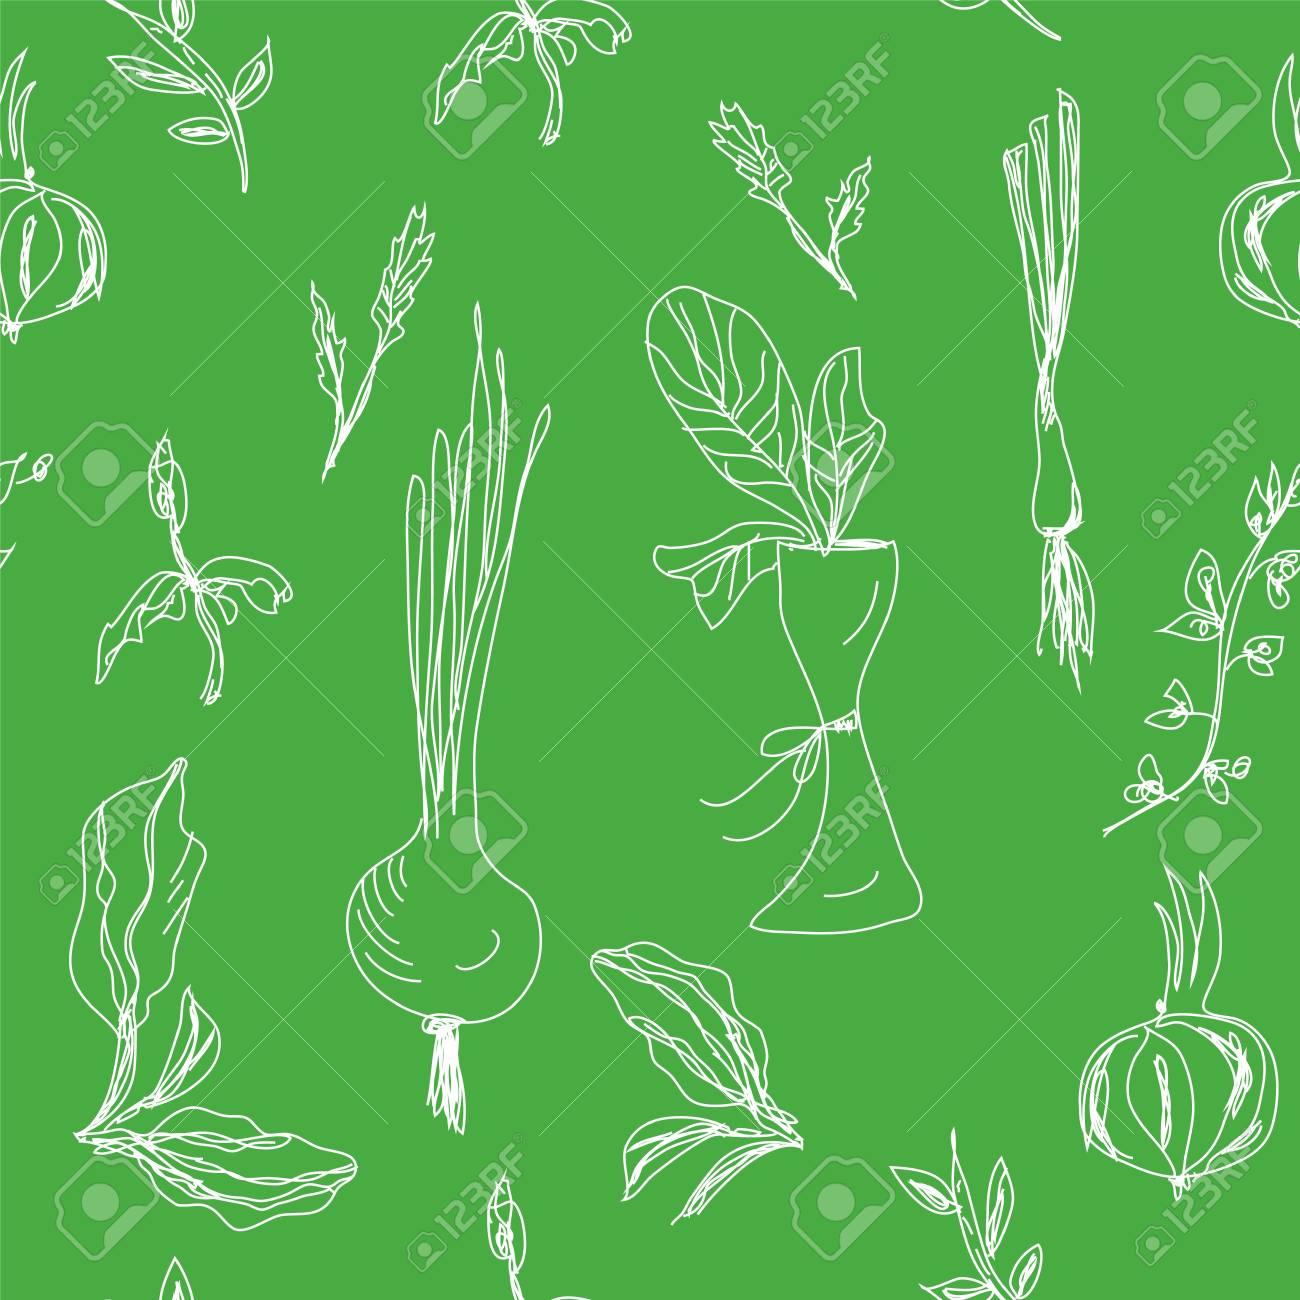 Greens and salad seamless hand drawn design Stock Vector - 17851195